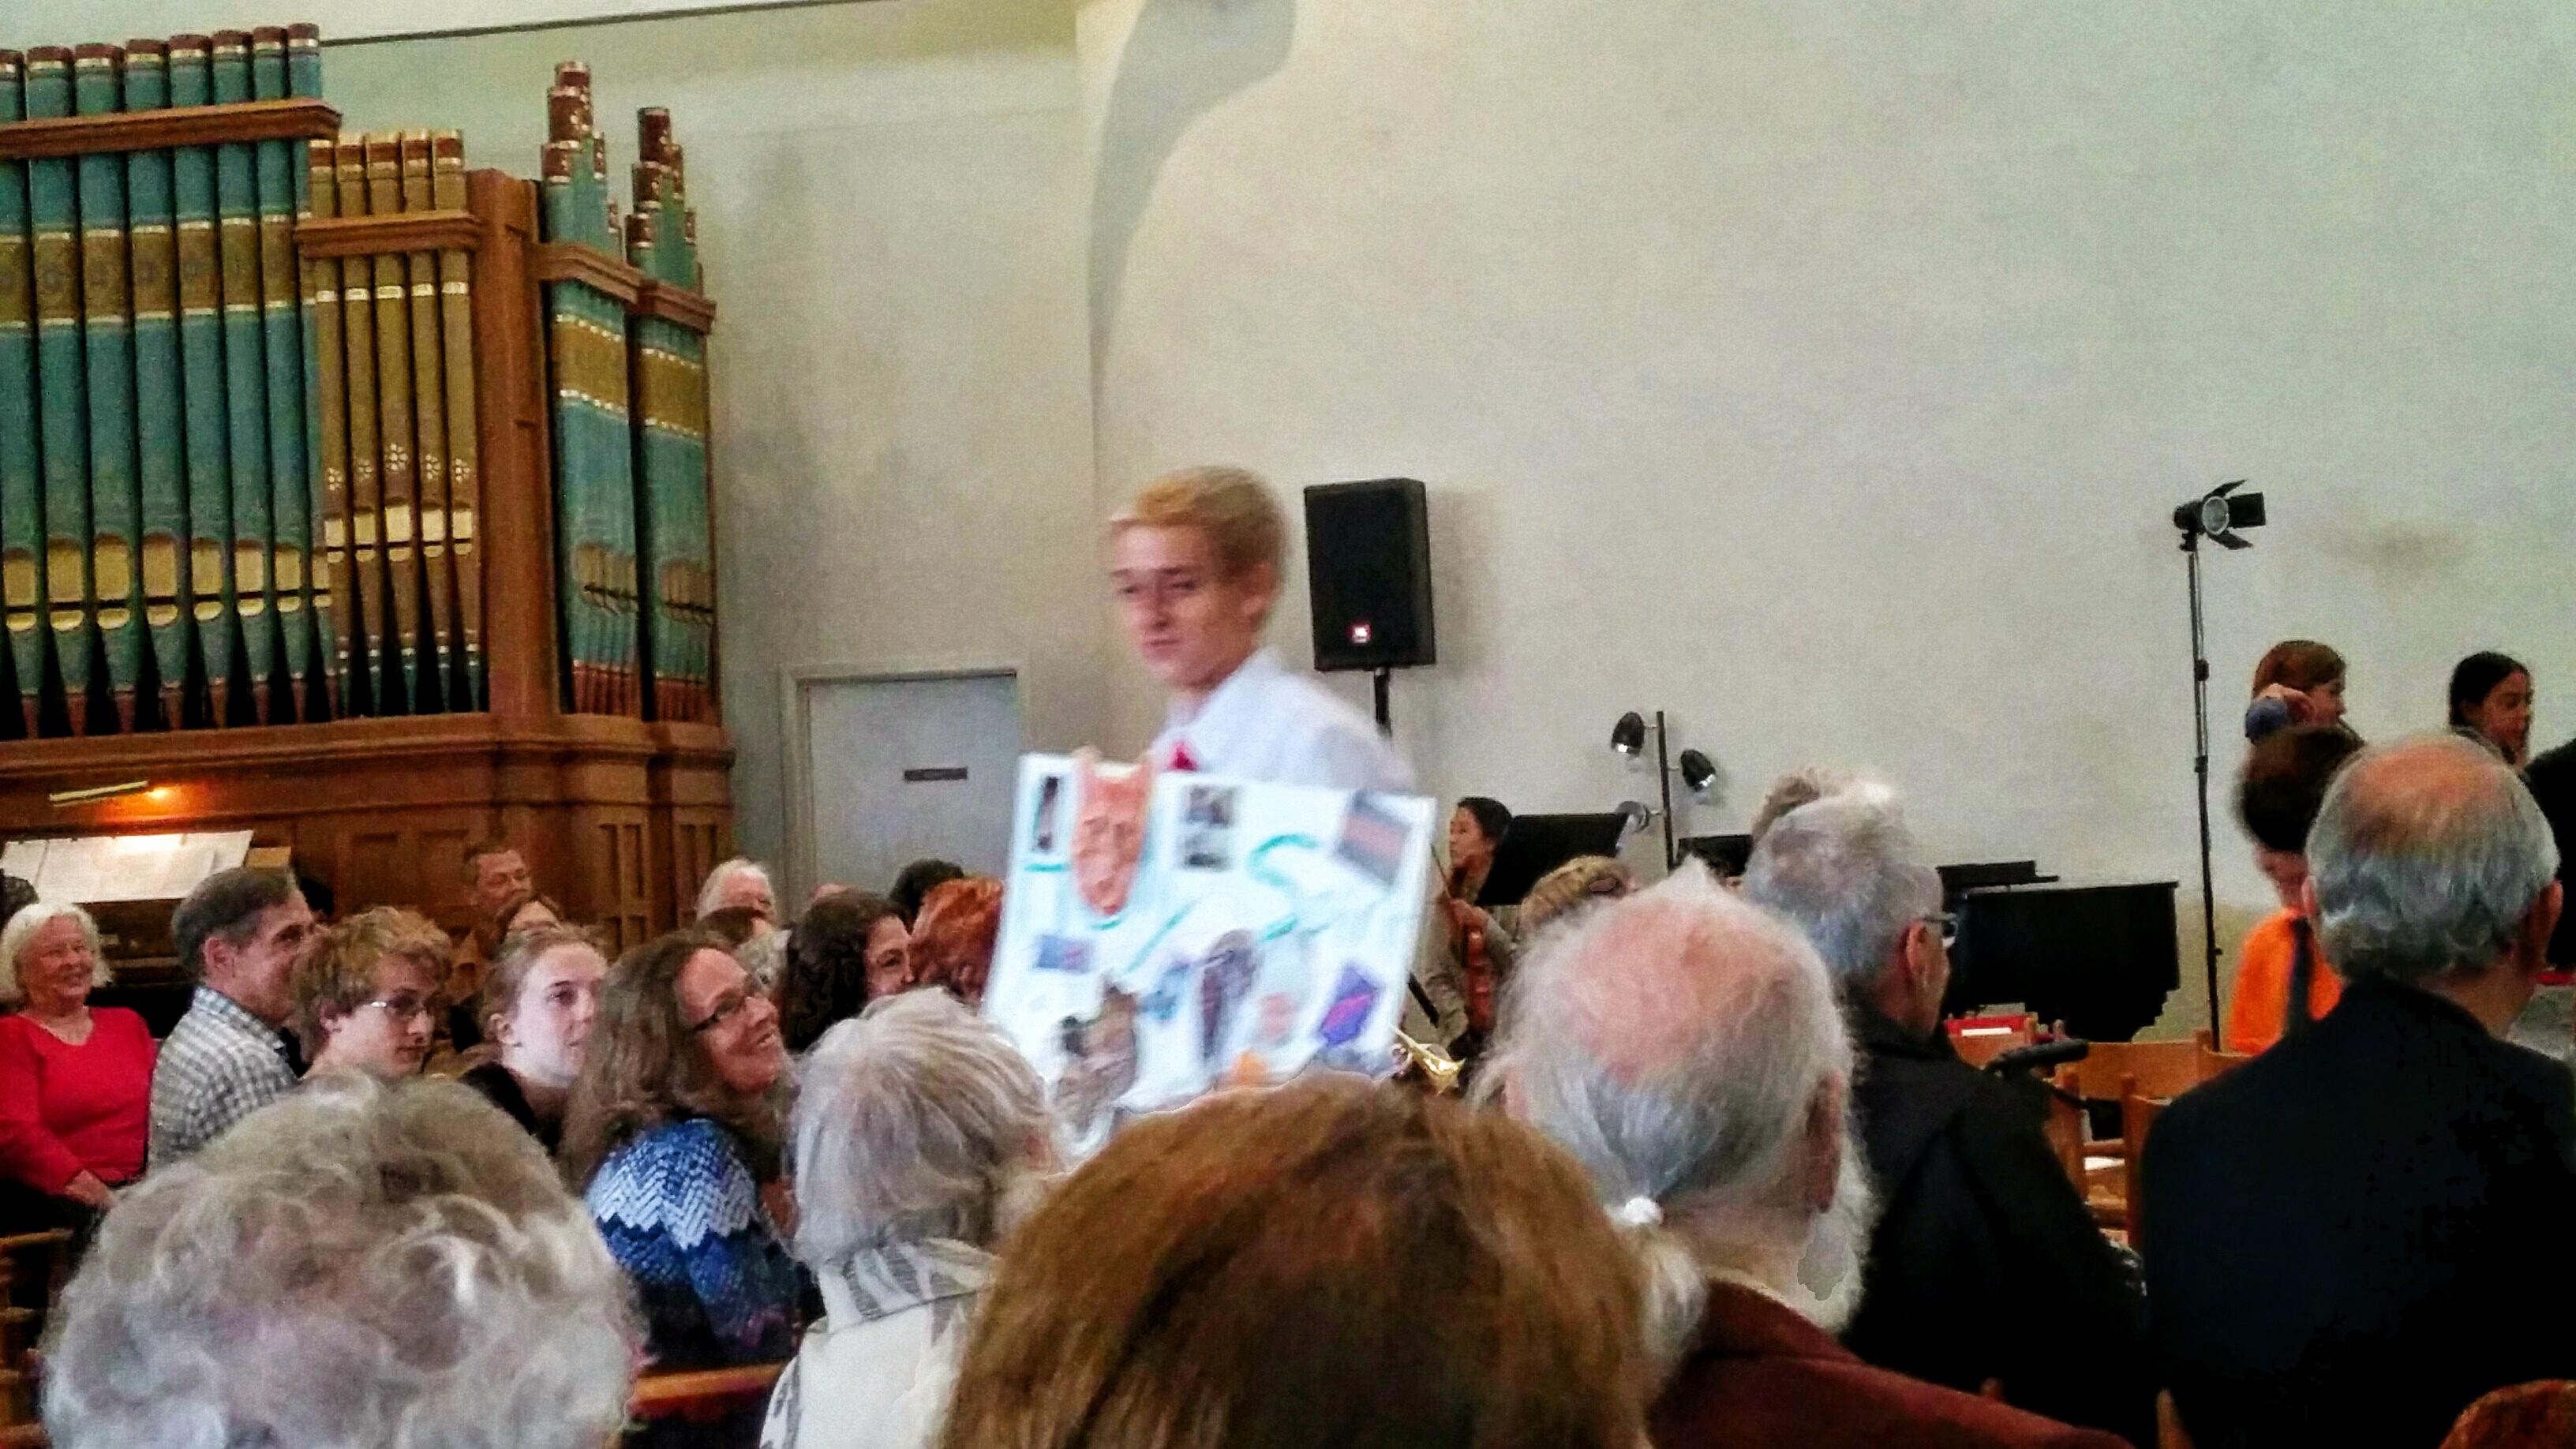 2015-05-24 Pentecost-Henry-Anderson-Confirmation 23.jpg